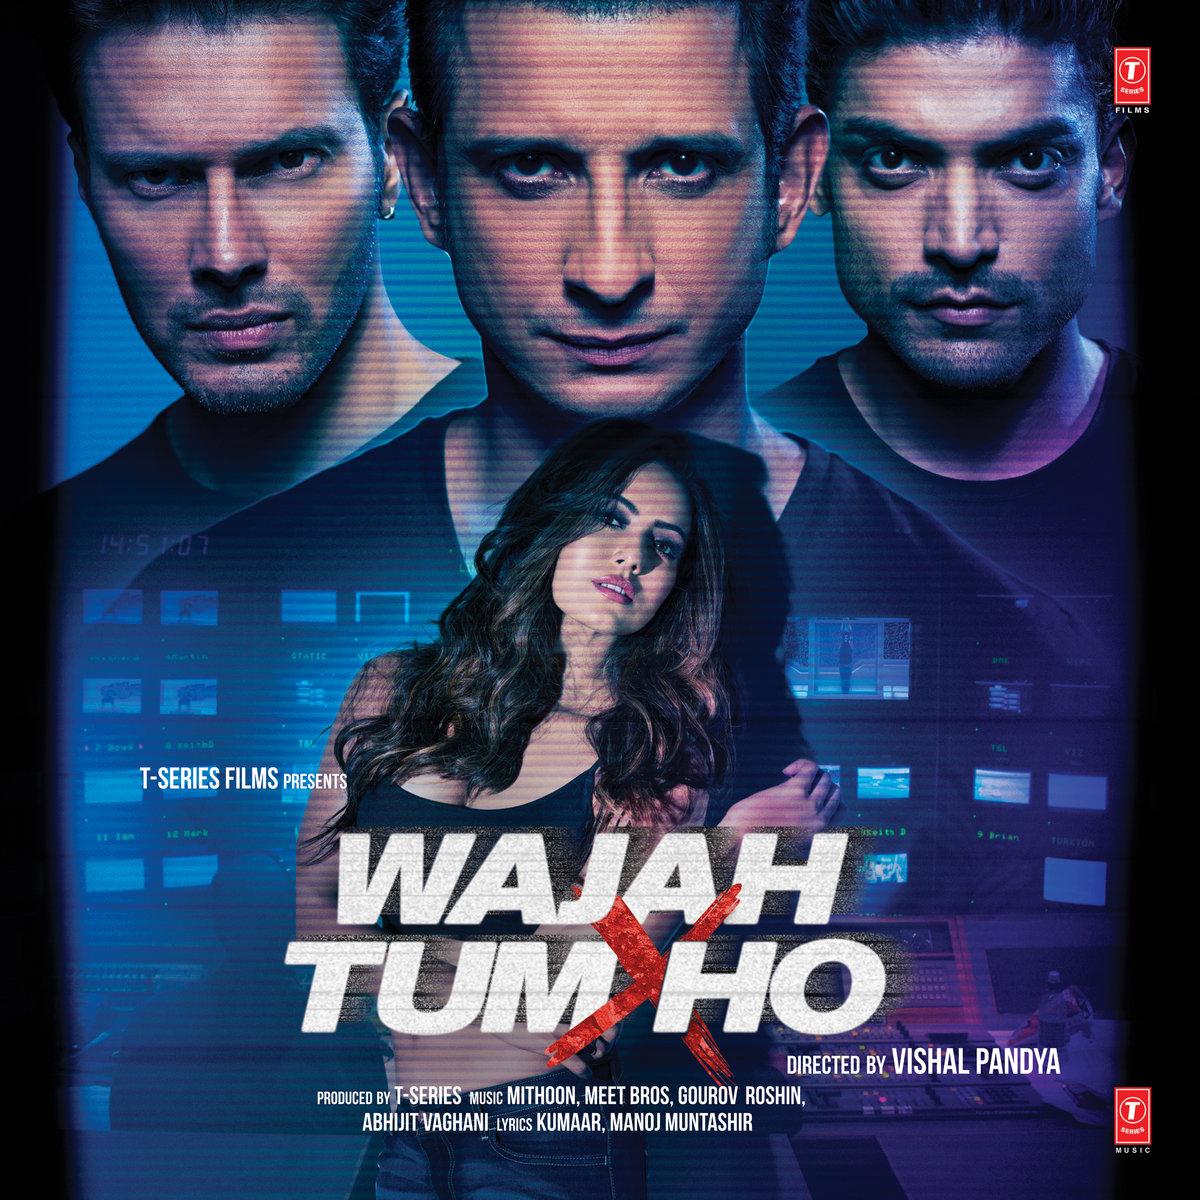 Home Alone 2 Movie Download Hindi Dubbed Www Papedelca Com